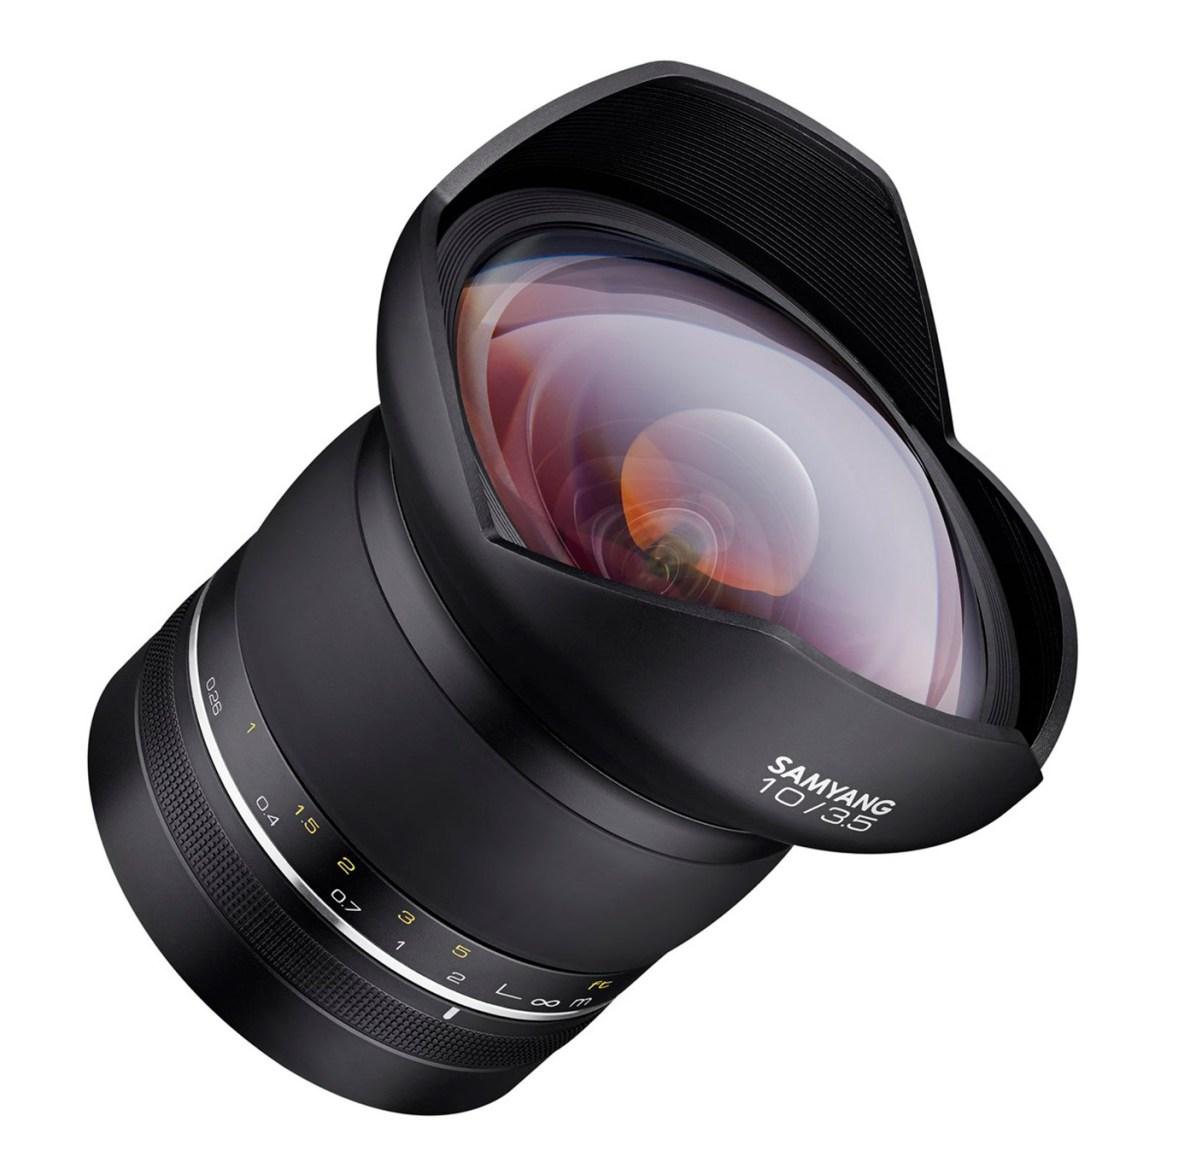 XP 10MM F3.5 (6) BD